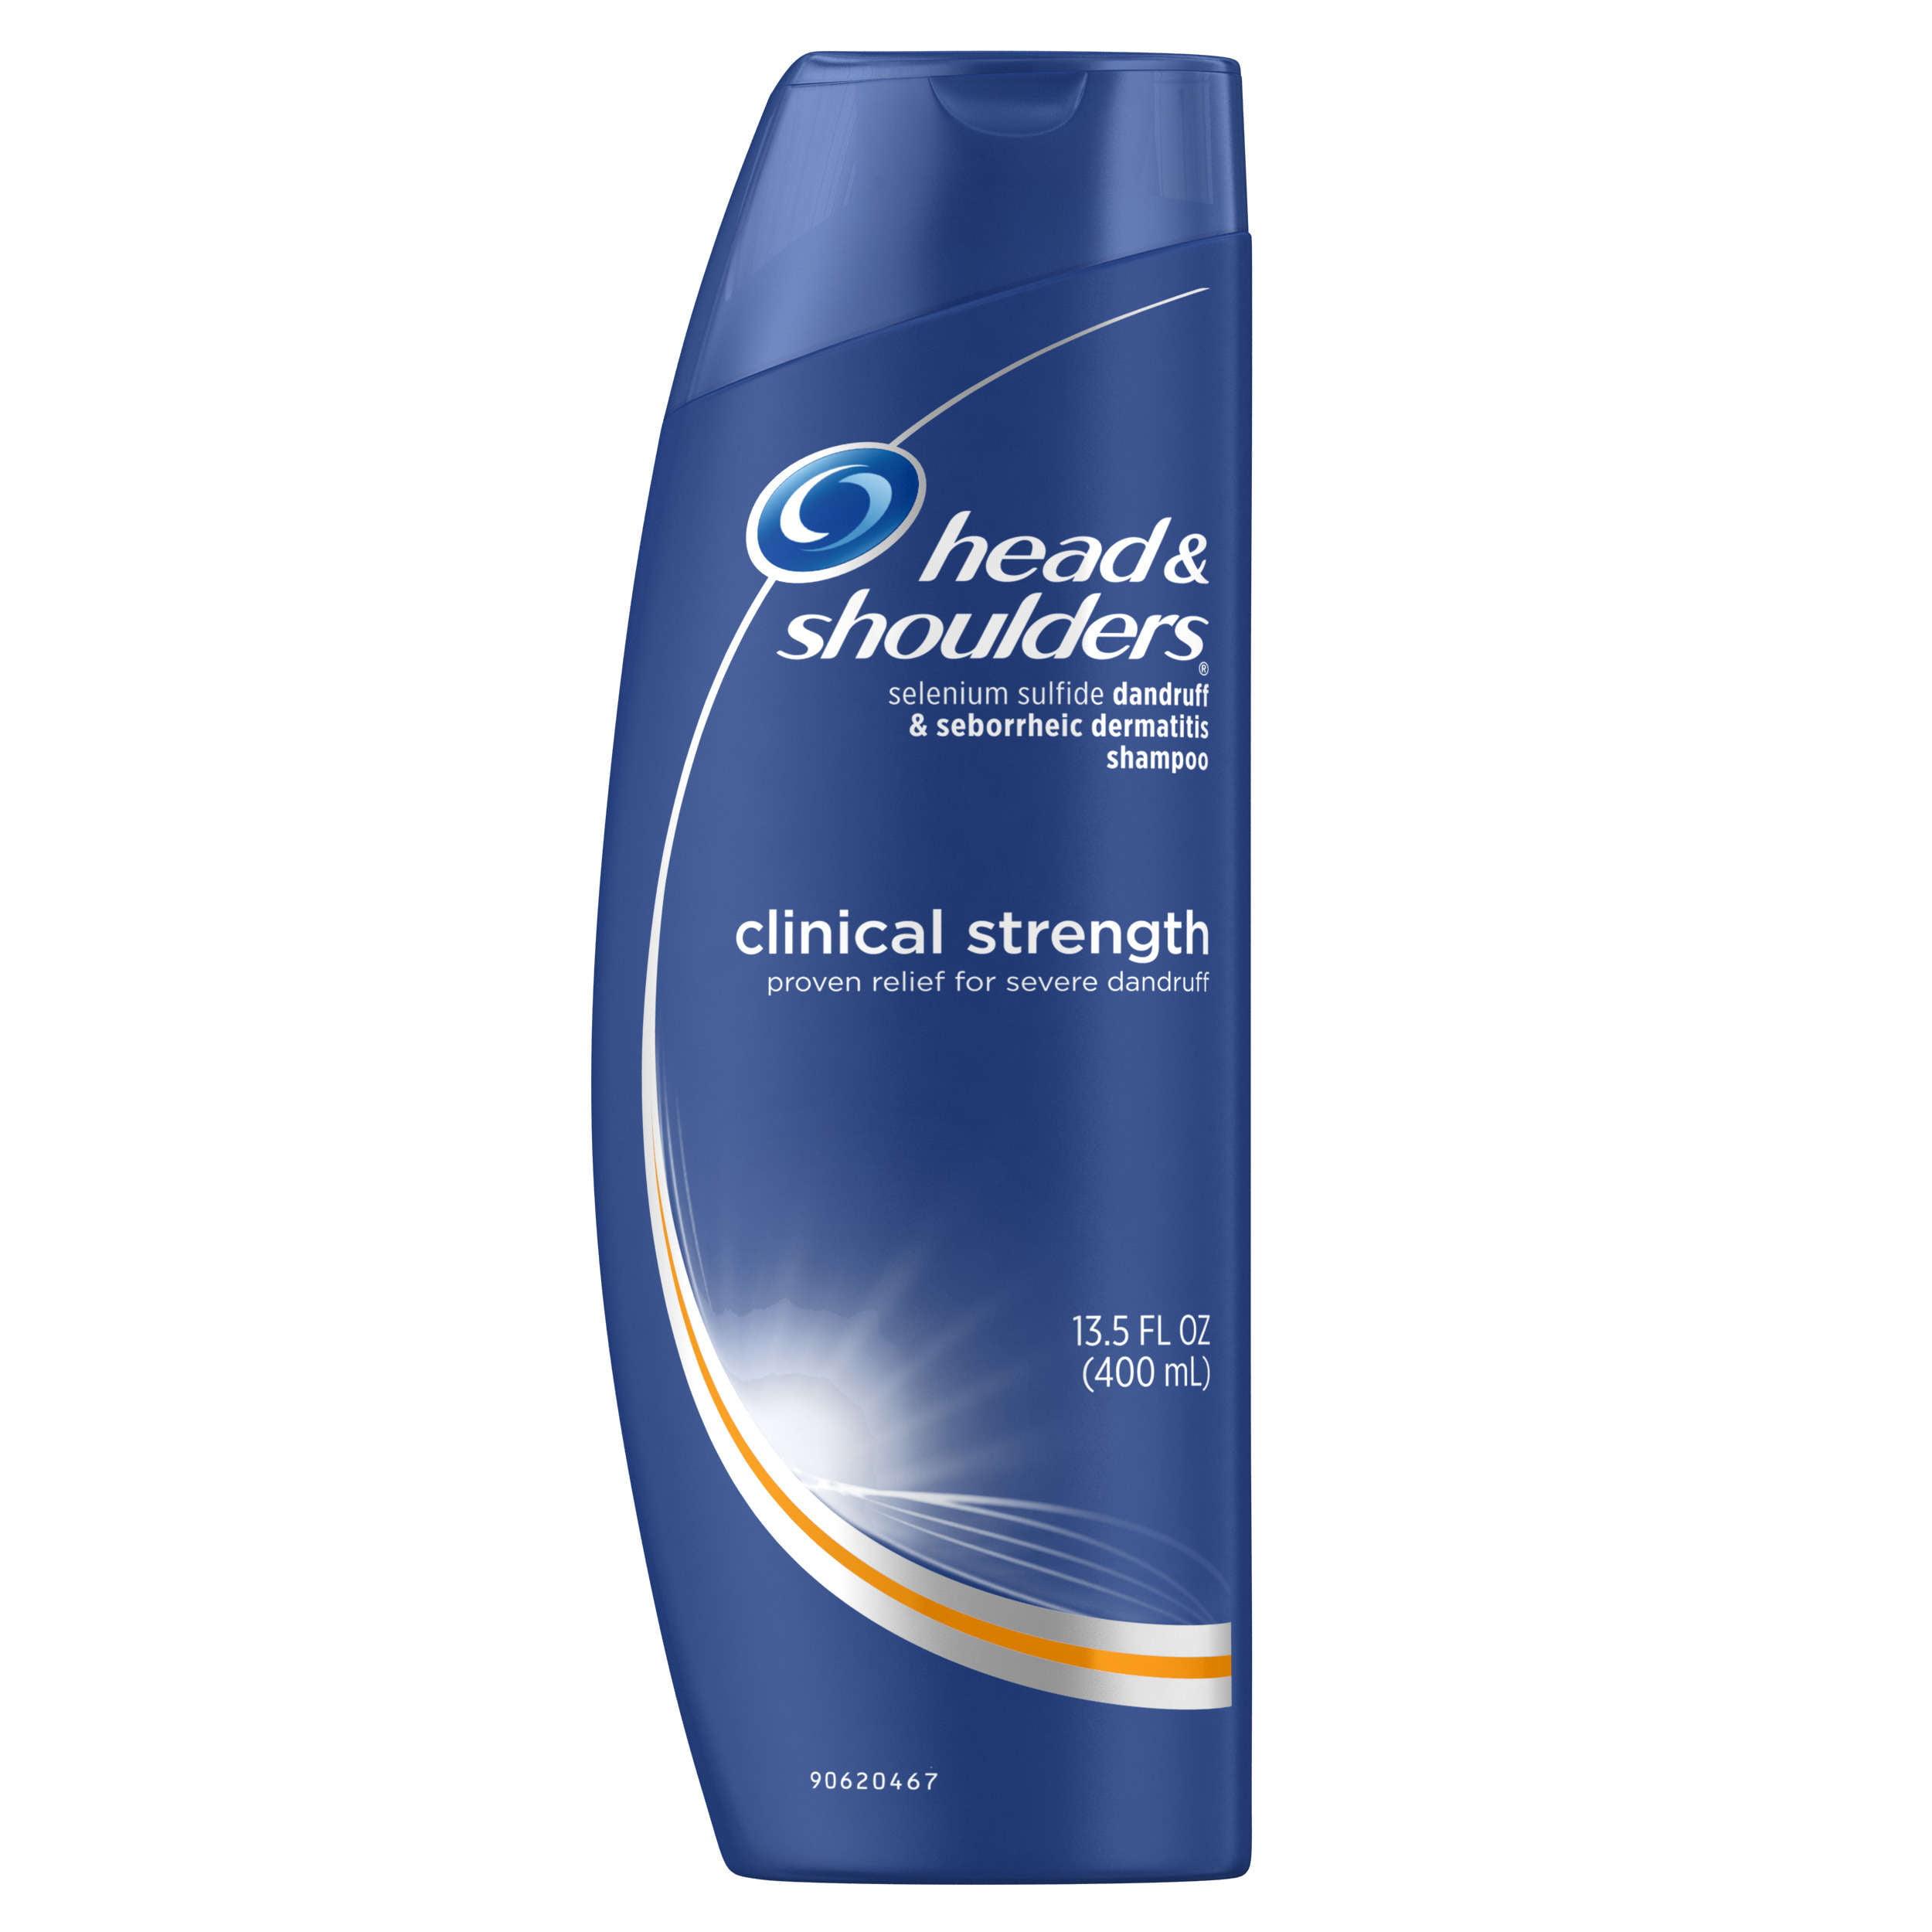 Head and Shoulders Clinical Strength Anti-Dandruff Shampoo 13.5 Fl Oz